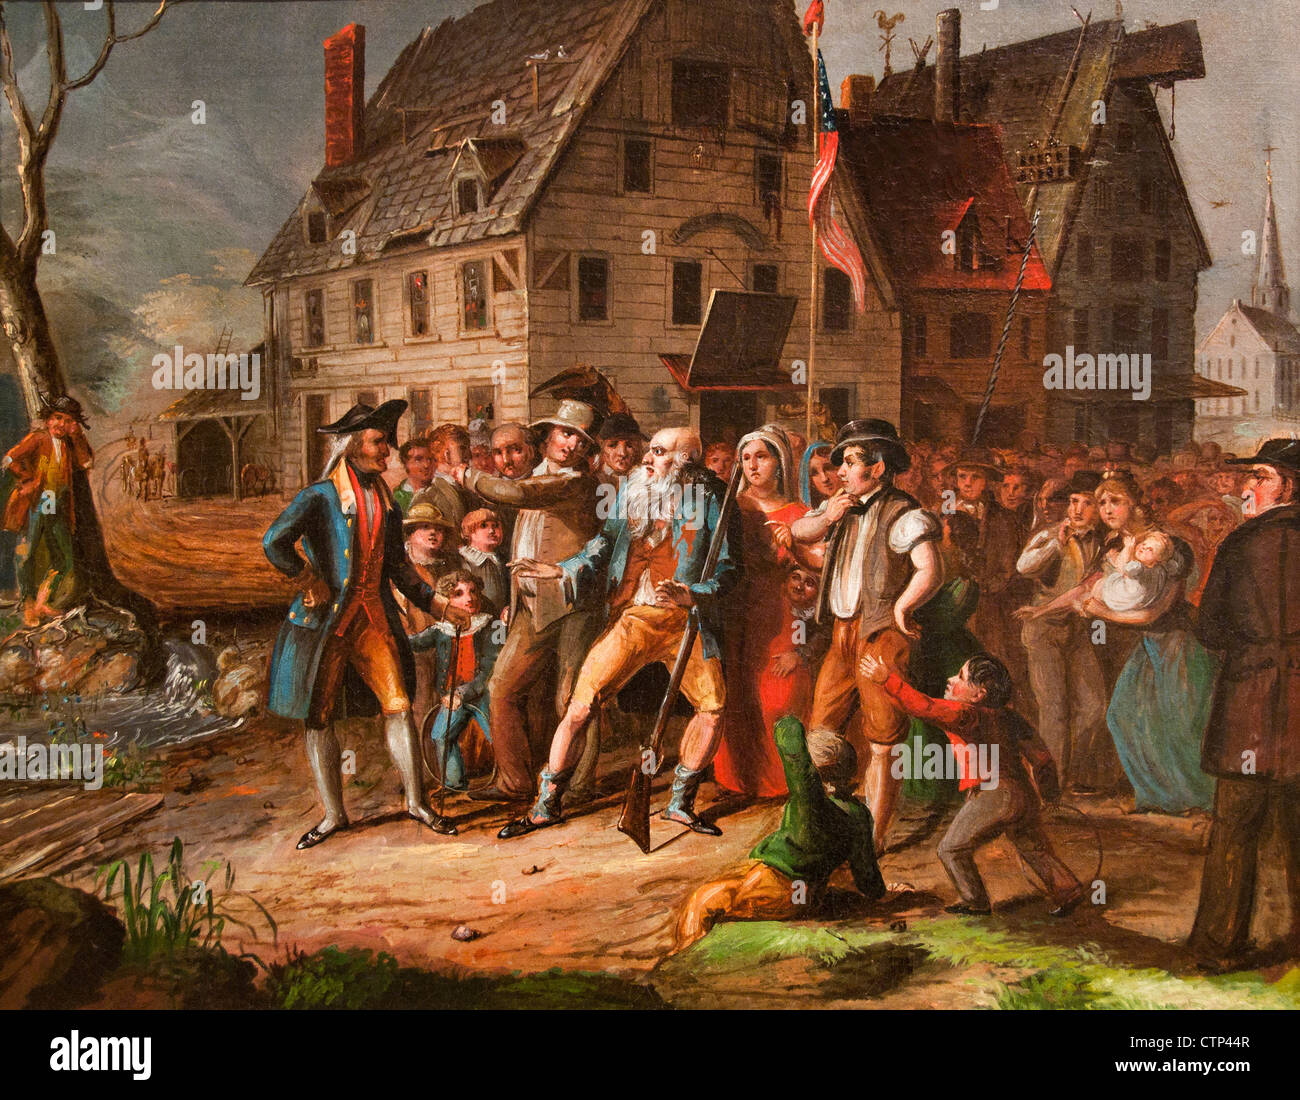 Rip van Winkle 1833 Albertis del Orient ( Washington Irving story ) American United States of America - Stock Image